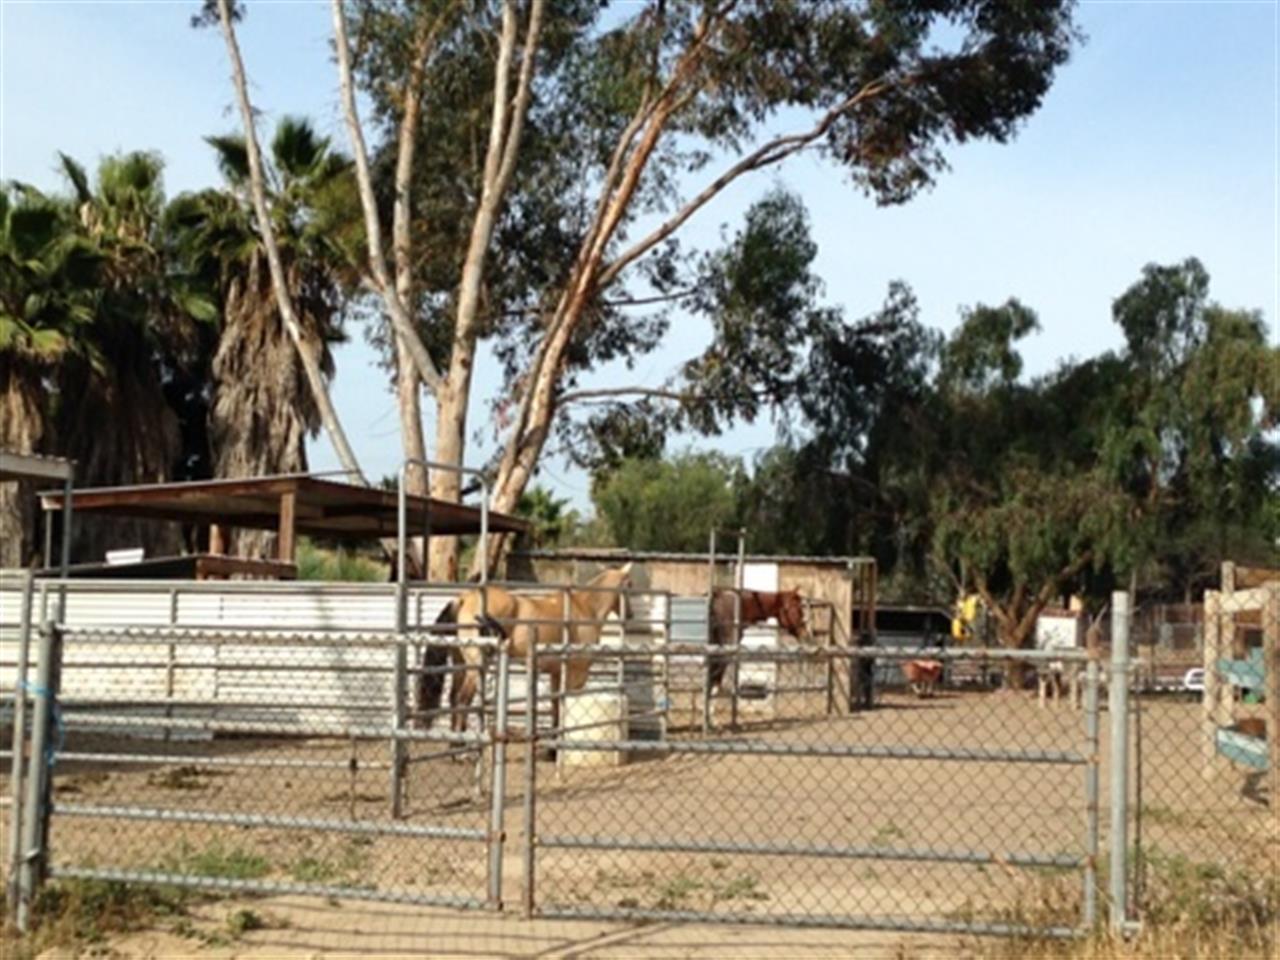 #Bonita #Horses #LeadingRElocal